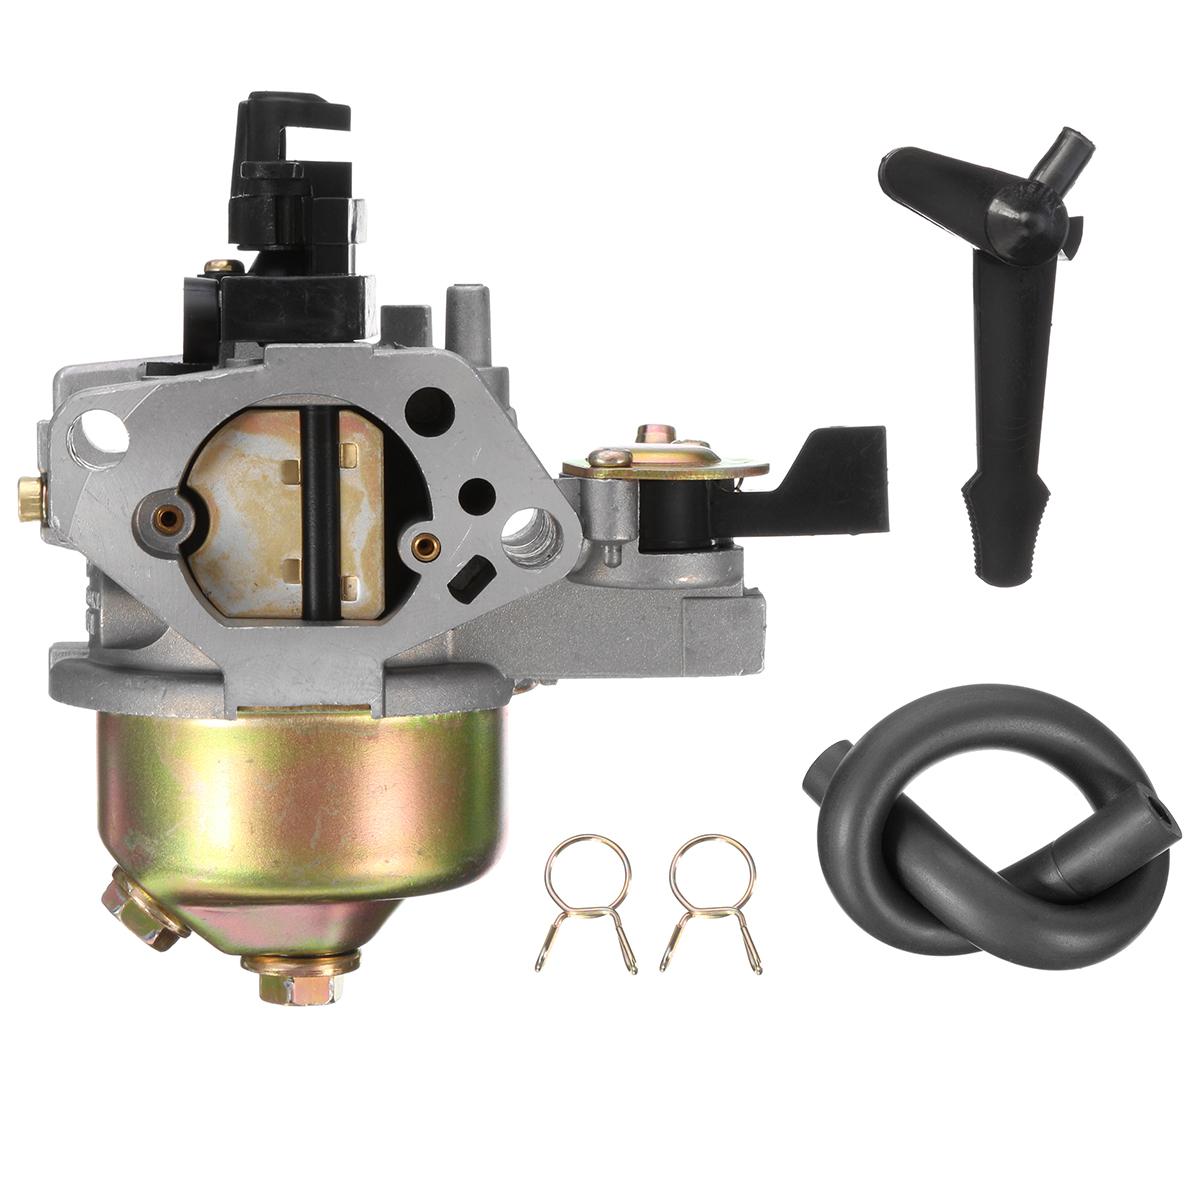 Carburetor Carb Lawn For HONDA GX390 13 HP Engine 16100-ZF6-V01 16100-